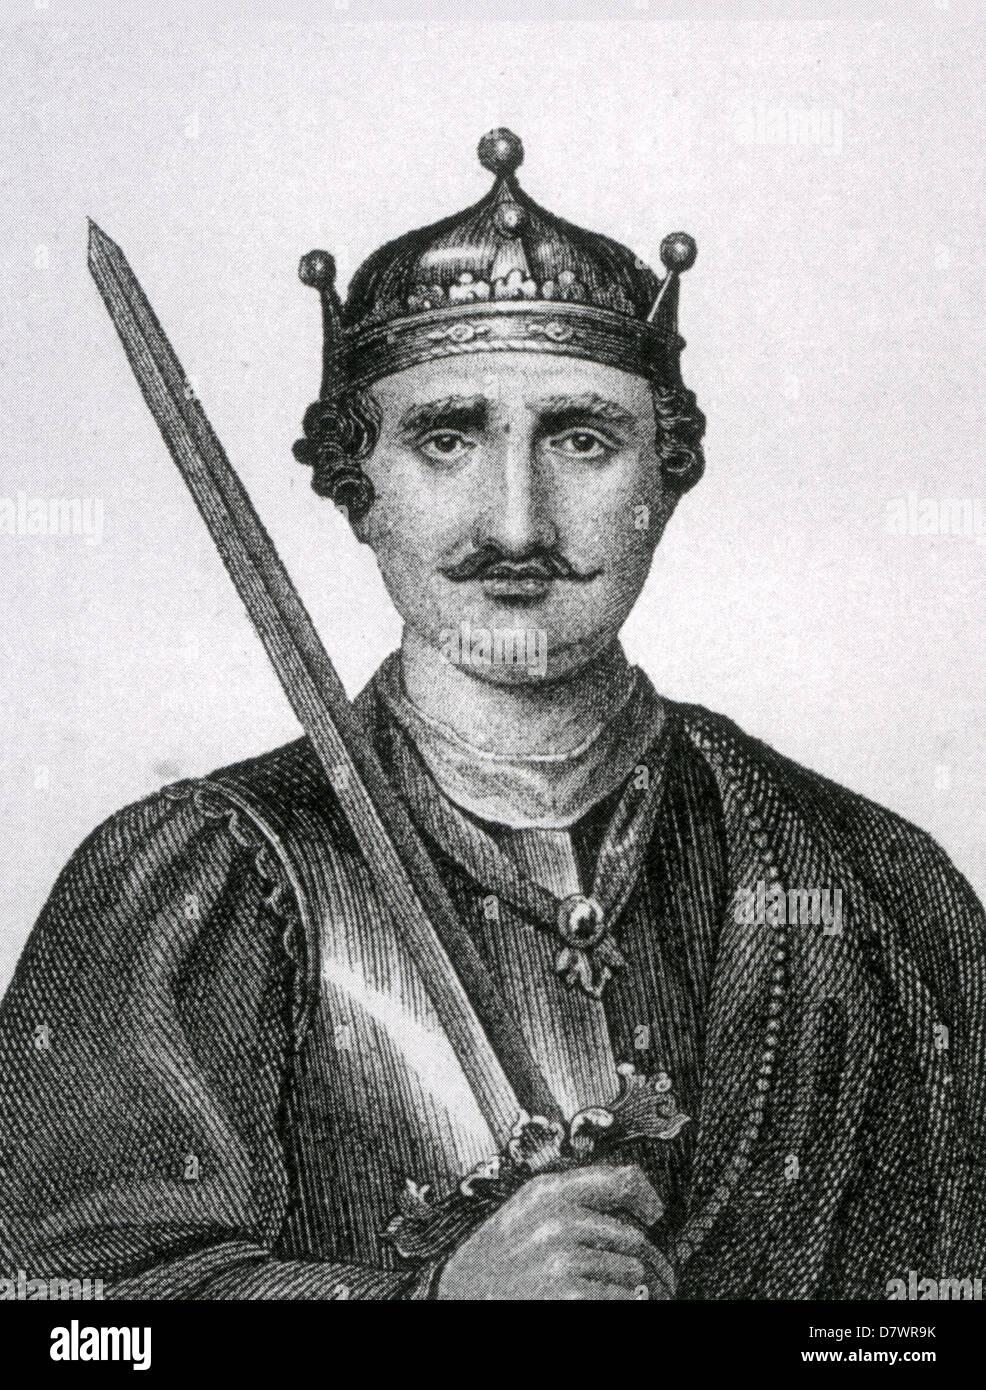 WILLIAM THE CONQUEROR (1028-1087) in a 19th century engraving - Stock Image